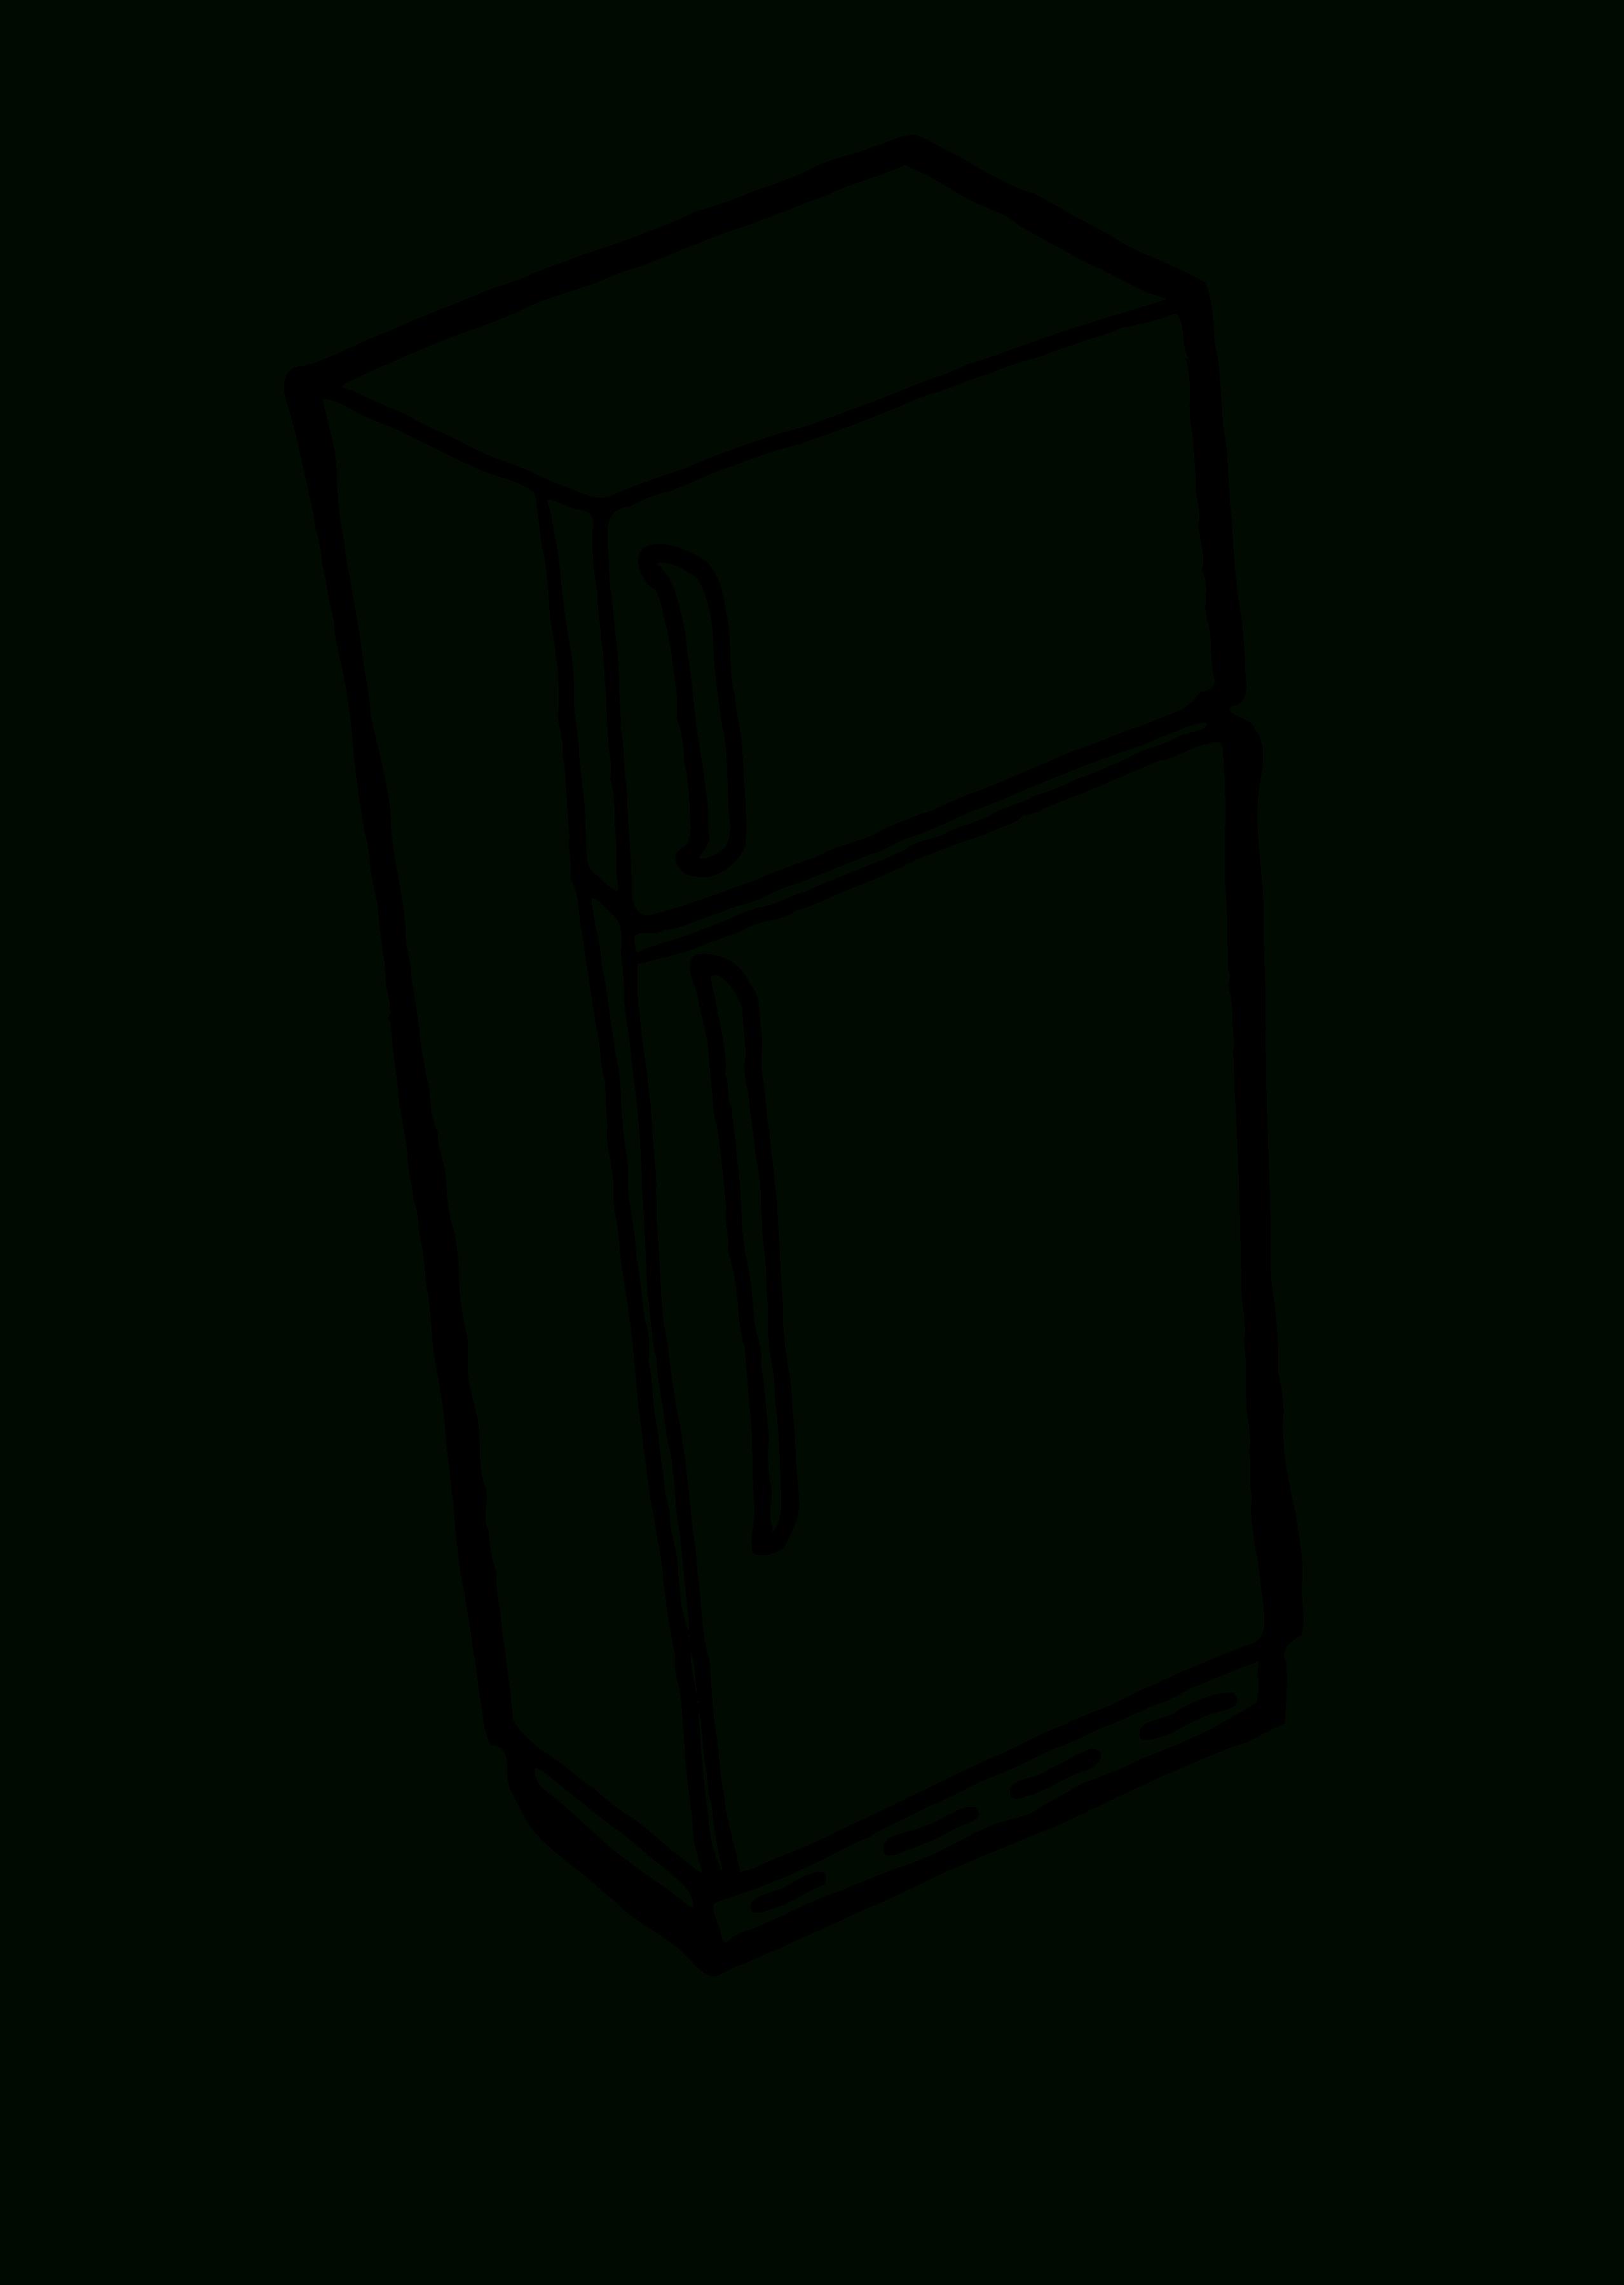 Refrigerator black and white. Fridge clipart transparent background